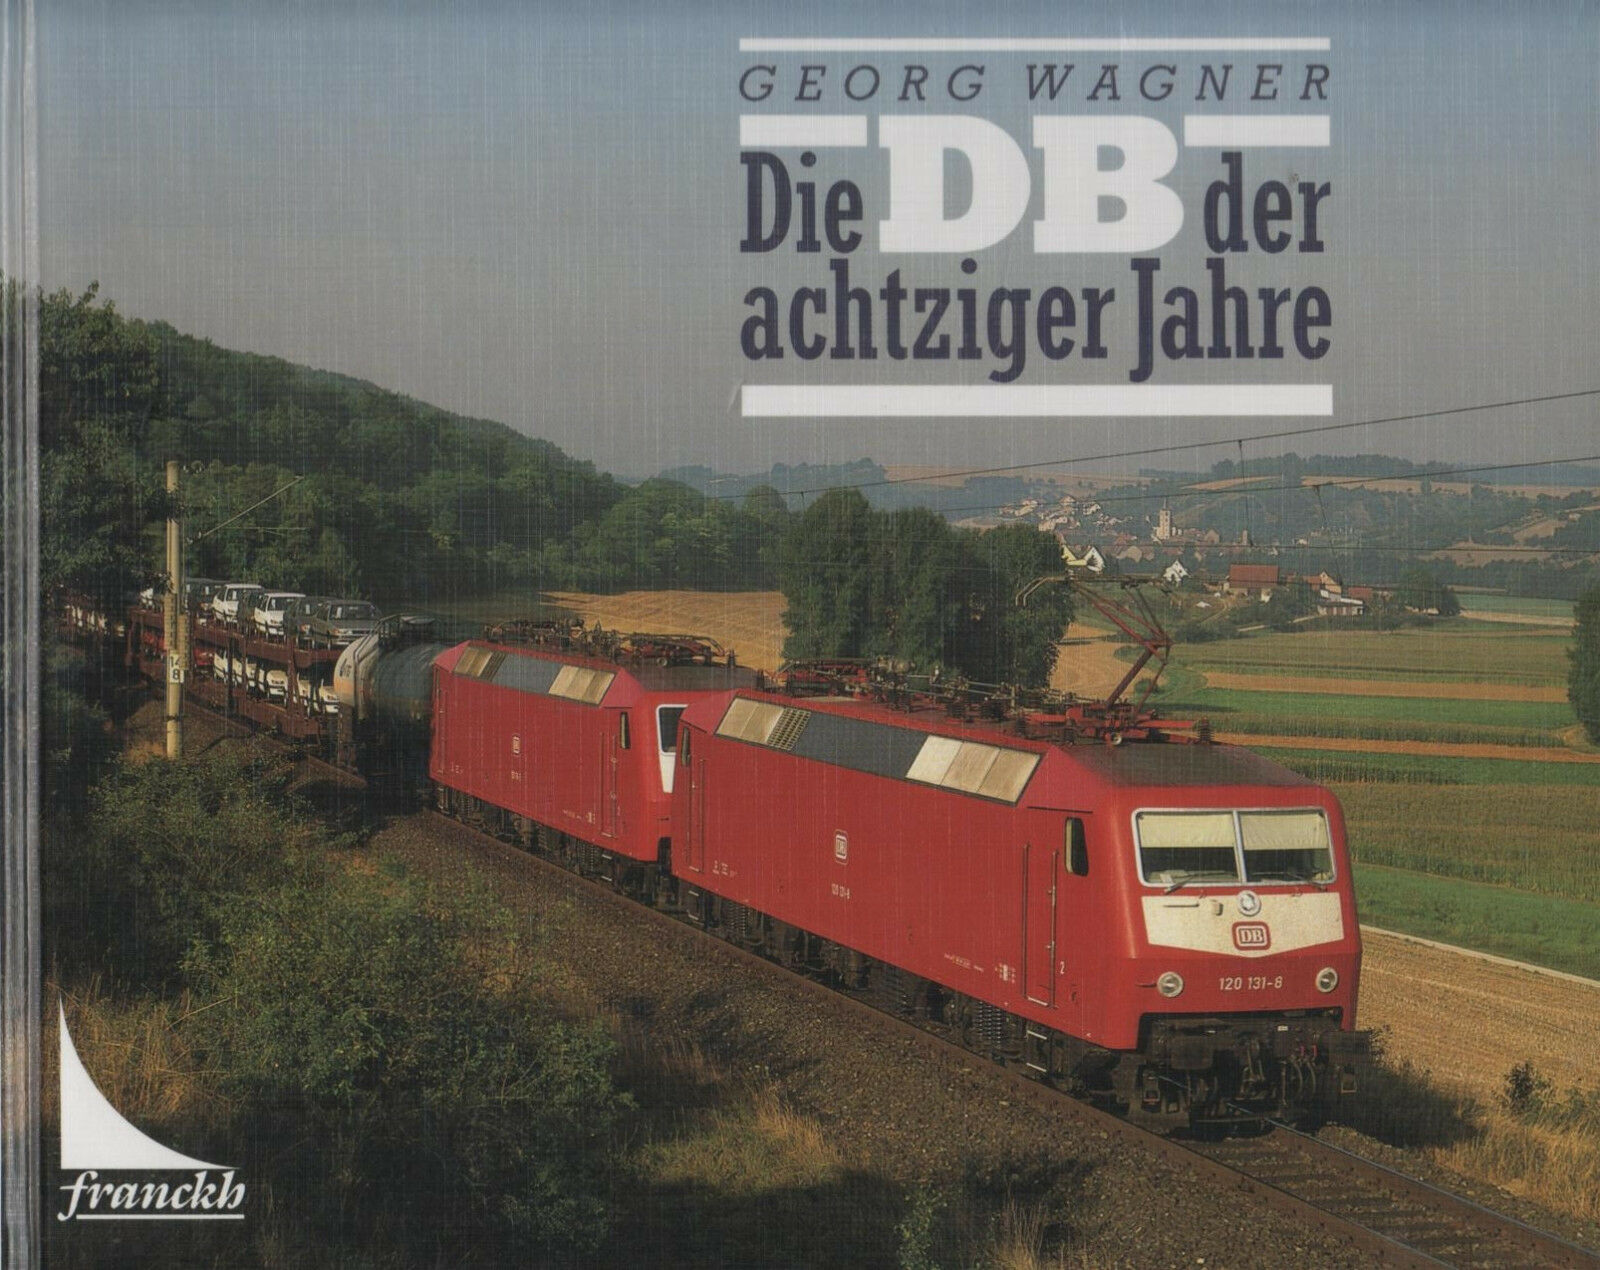 La DB degli ferrovie anni ottanta-Georg Wagner-FERROVIE-e-locomotive - ferrovie degli 7b3c05